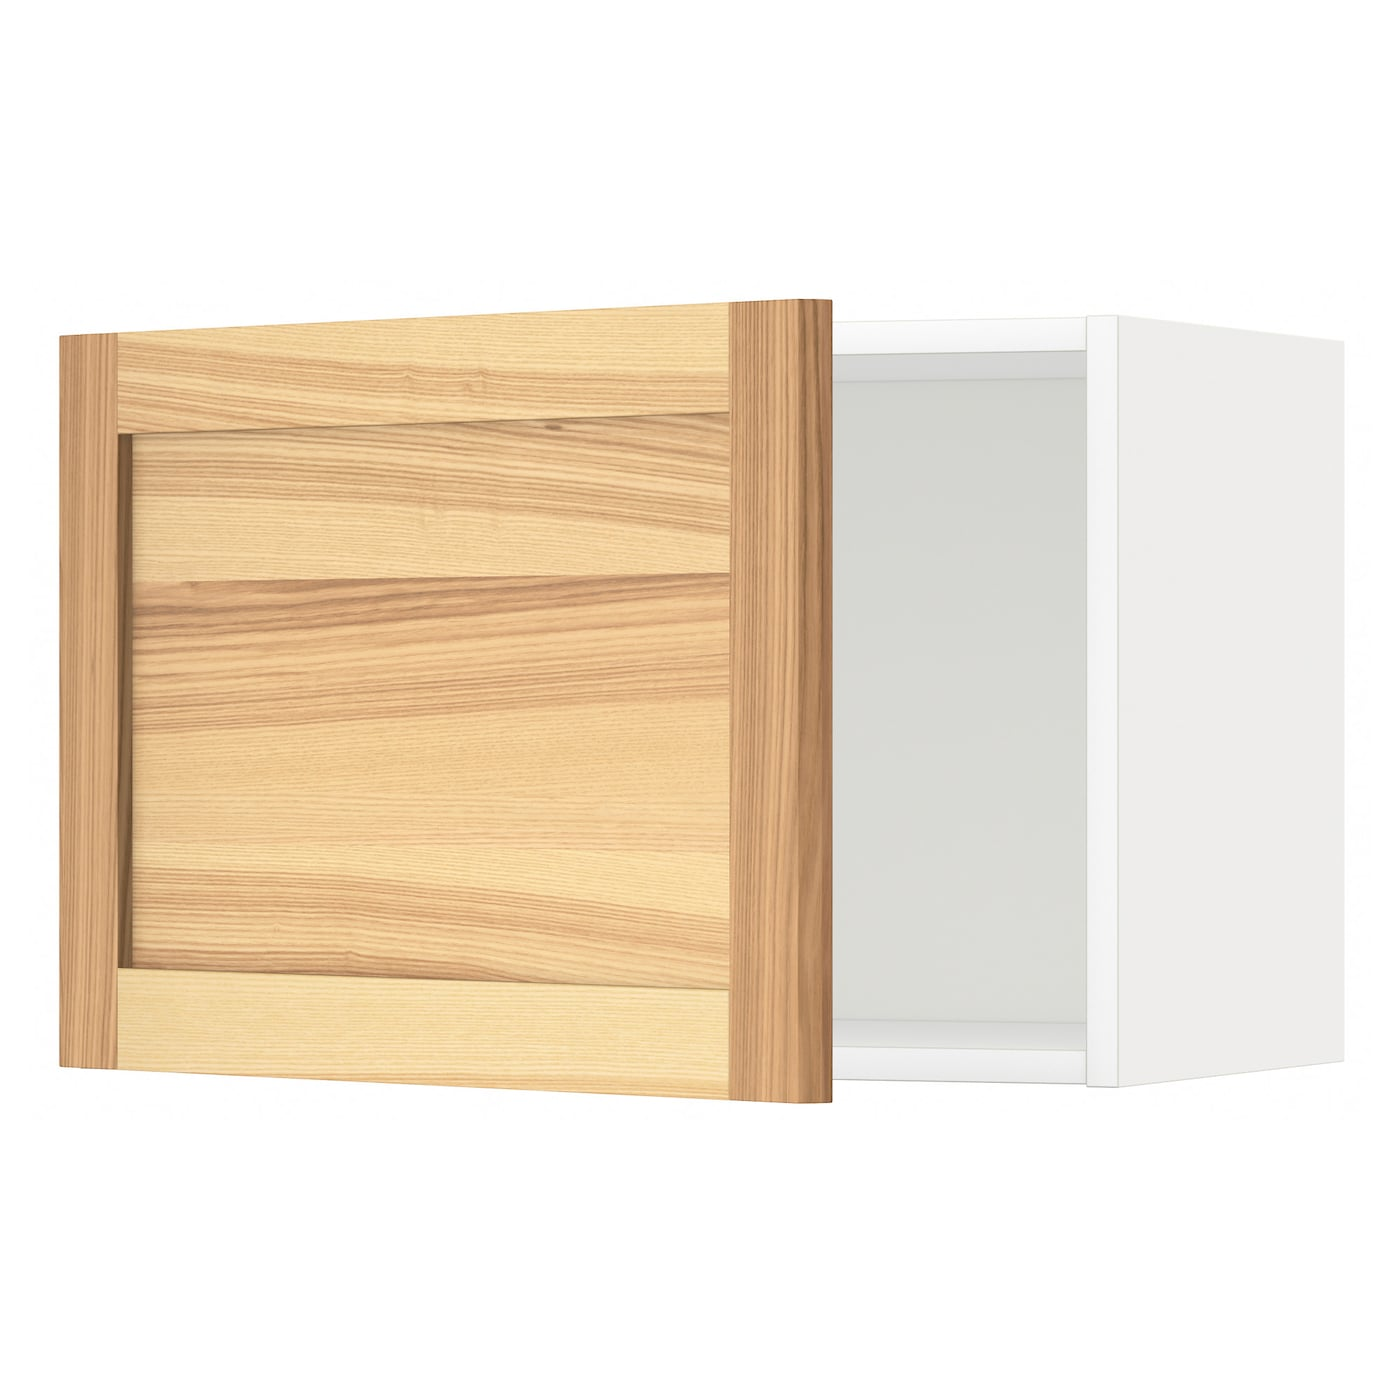 metod bovenkast wit torhamn essen 60 x 40 cm ikea. Black Bedroom Furniture Sets. Home Design Ideas